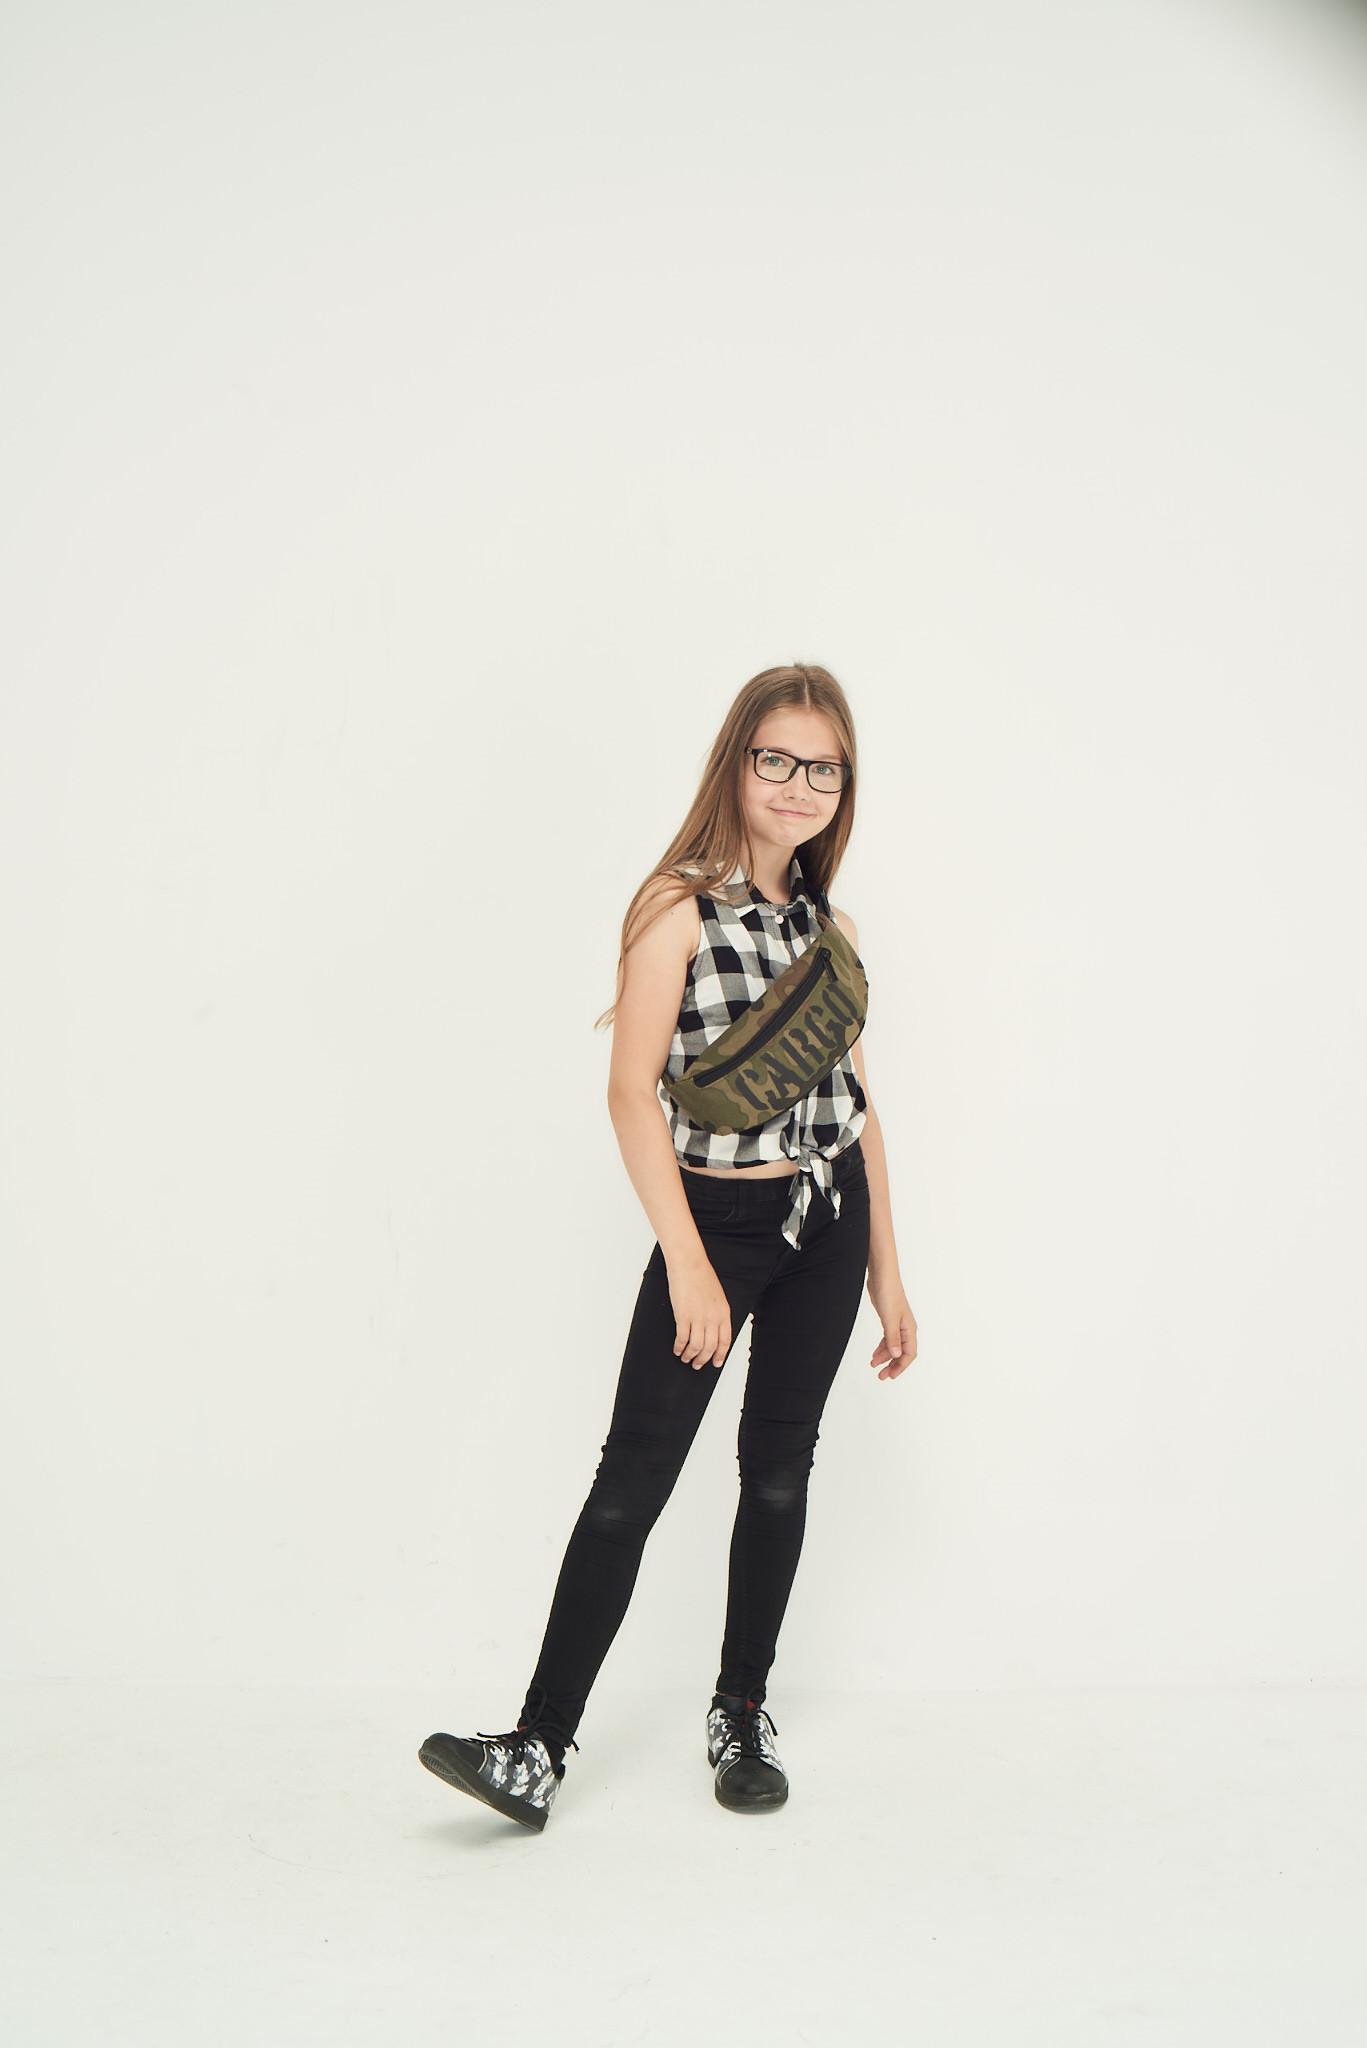 Nerka Reflective - kids - CARGO by OWEE